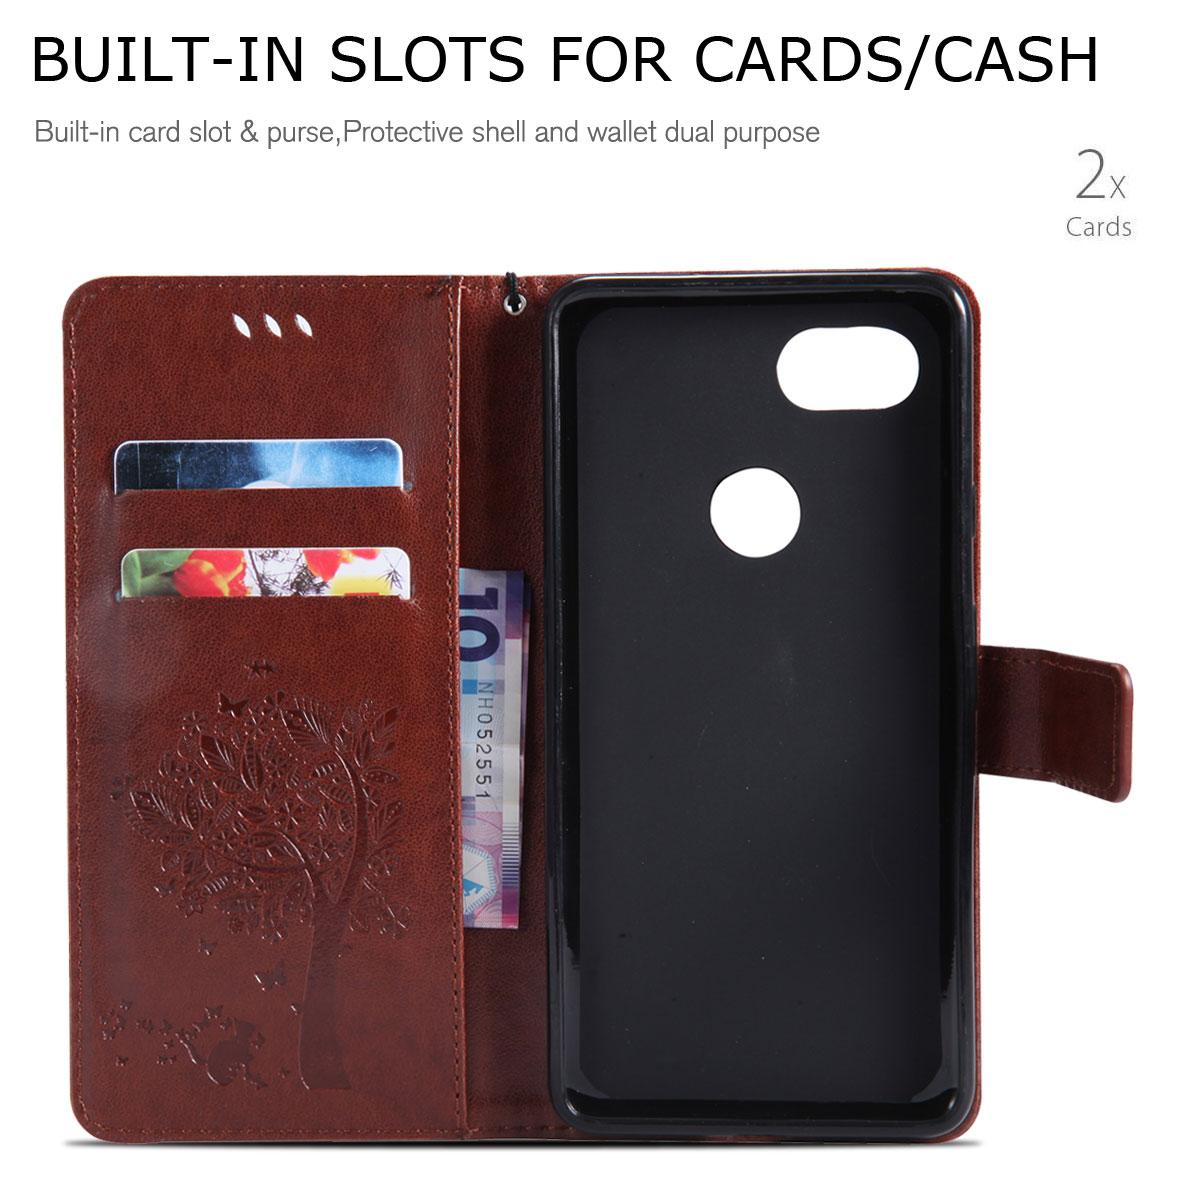 Magnetic-Leather-Credit-Card-Holder-Flip-Case-Cover-For-Google-Pixel-2-2-XL thumbnail 27